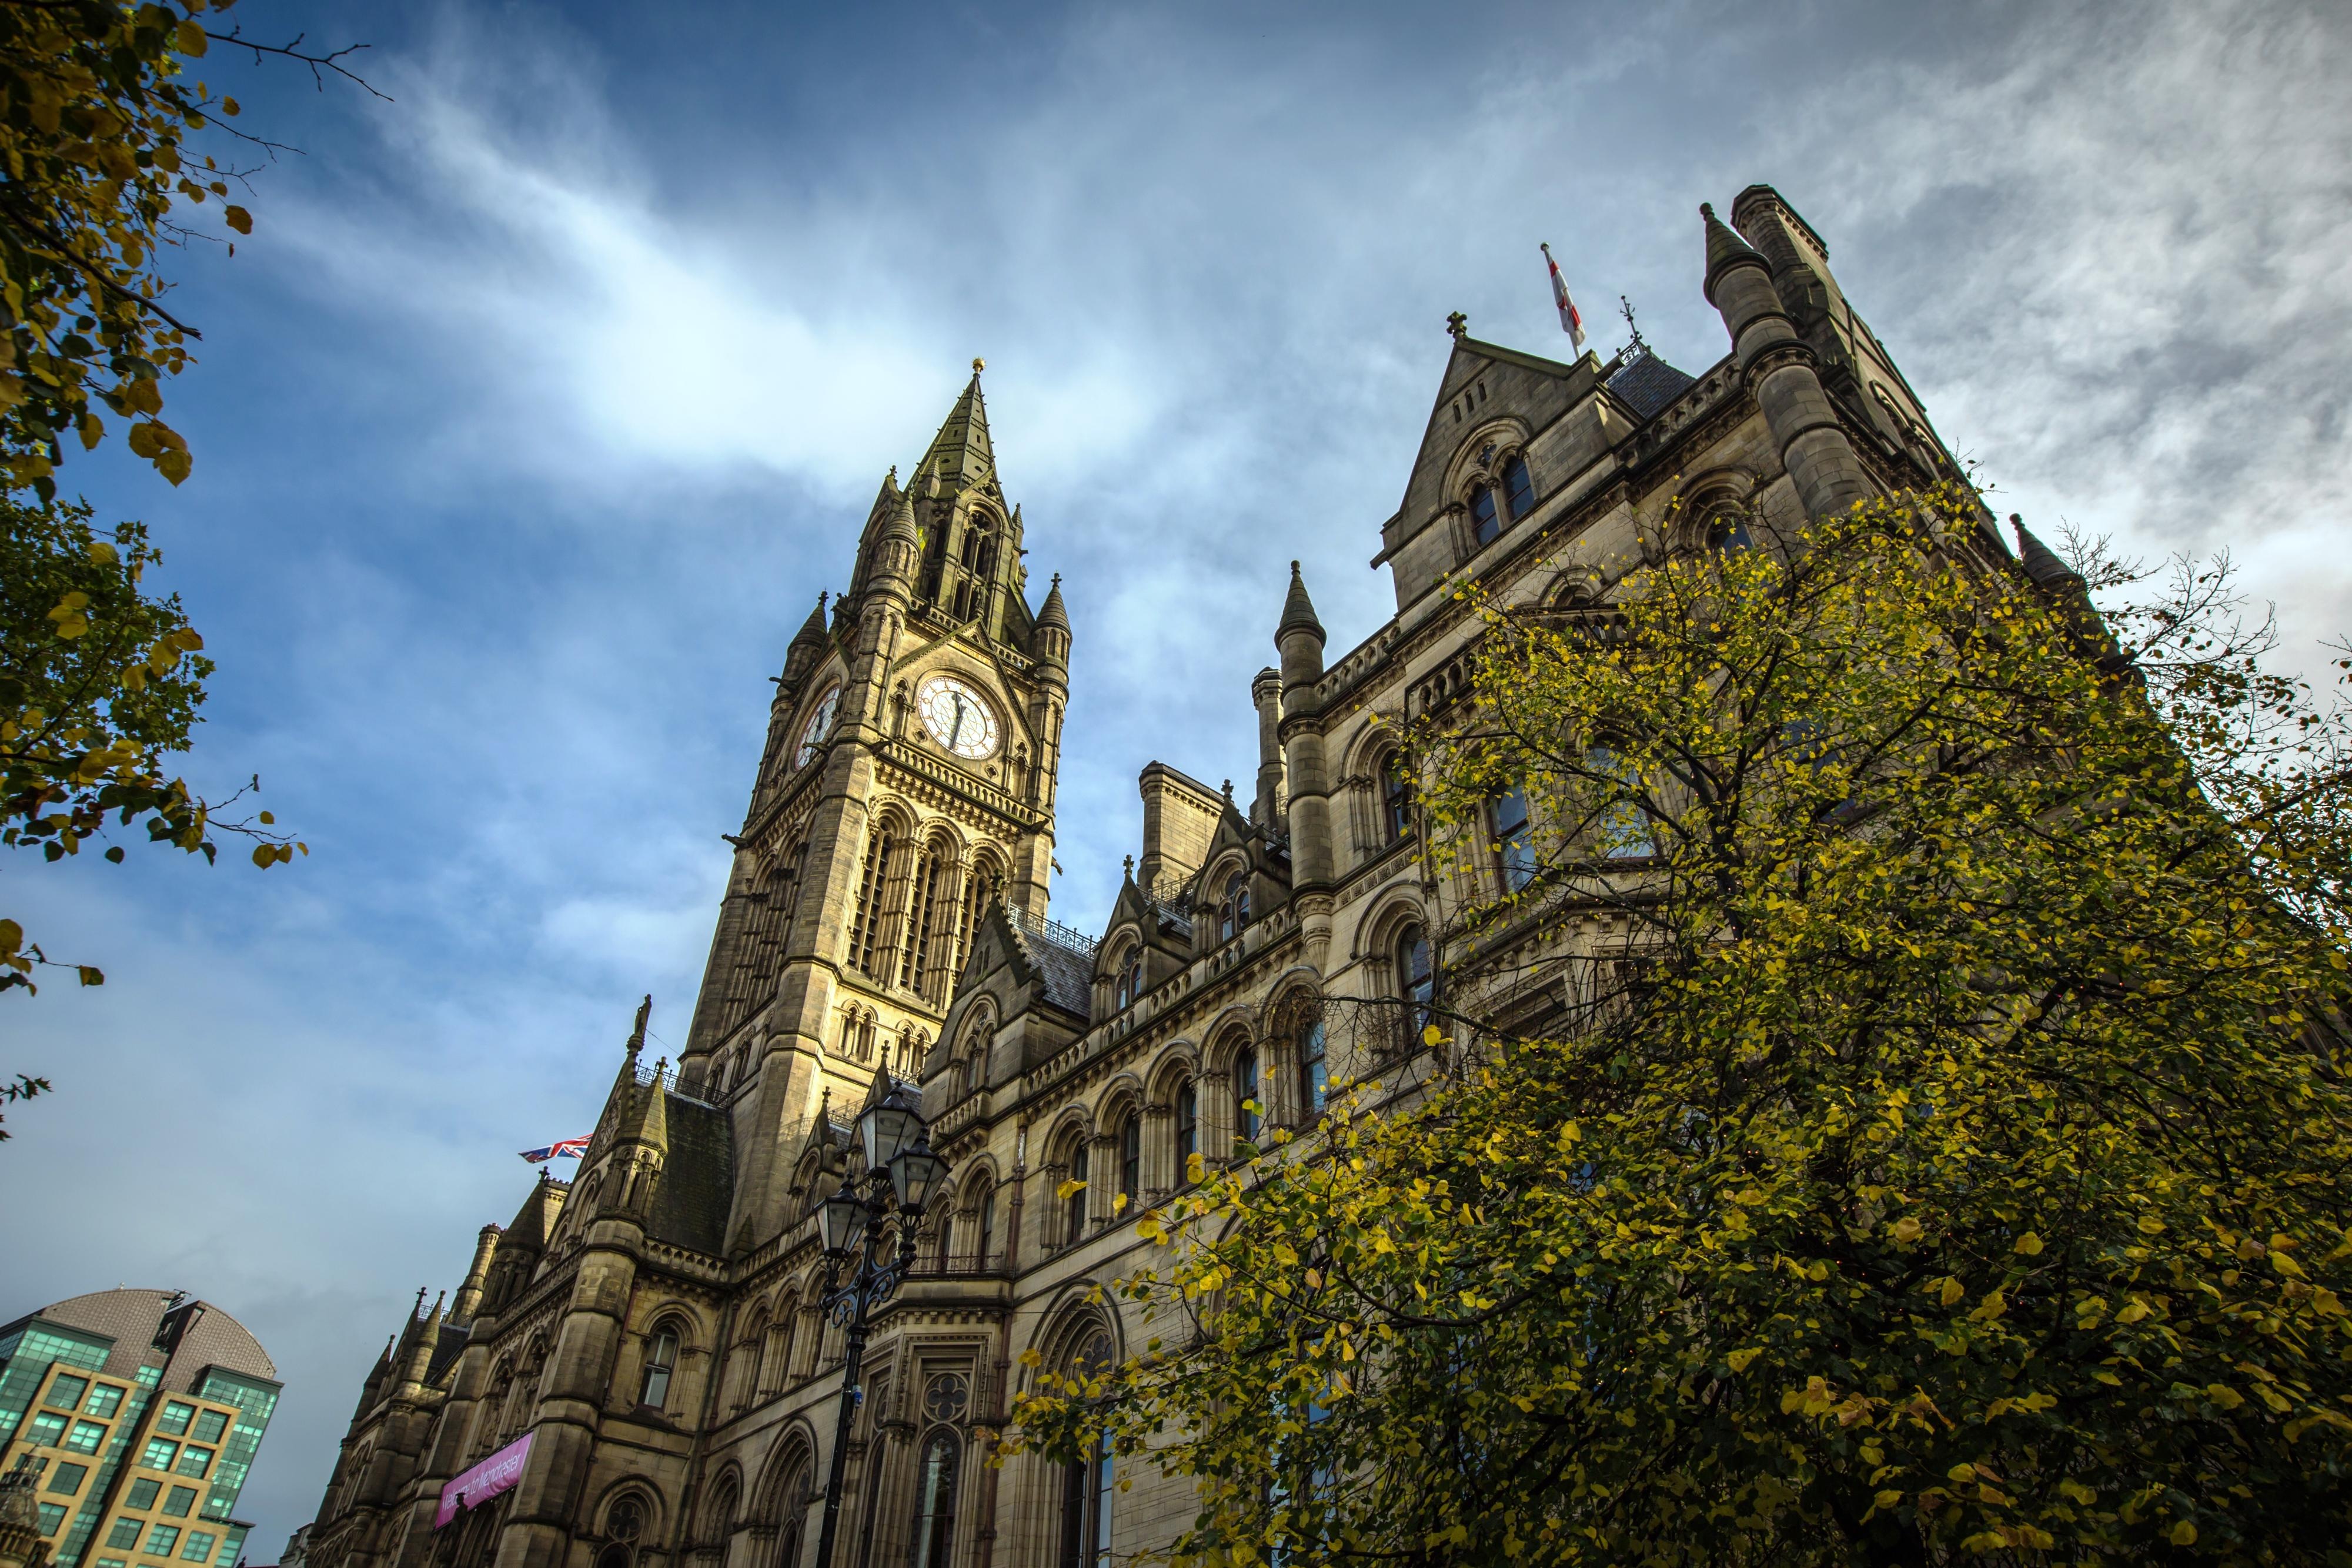 ManchesterTown Hall